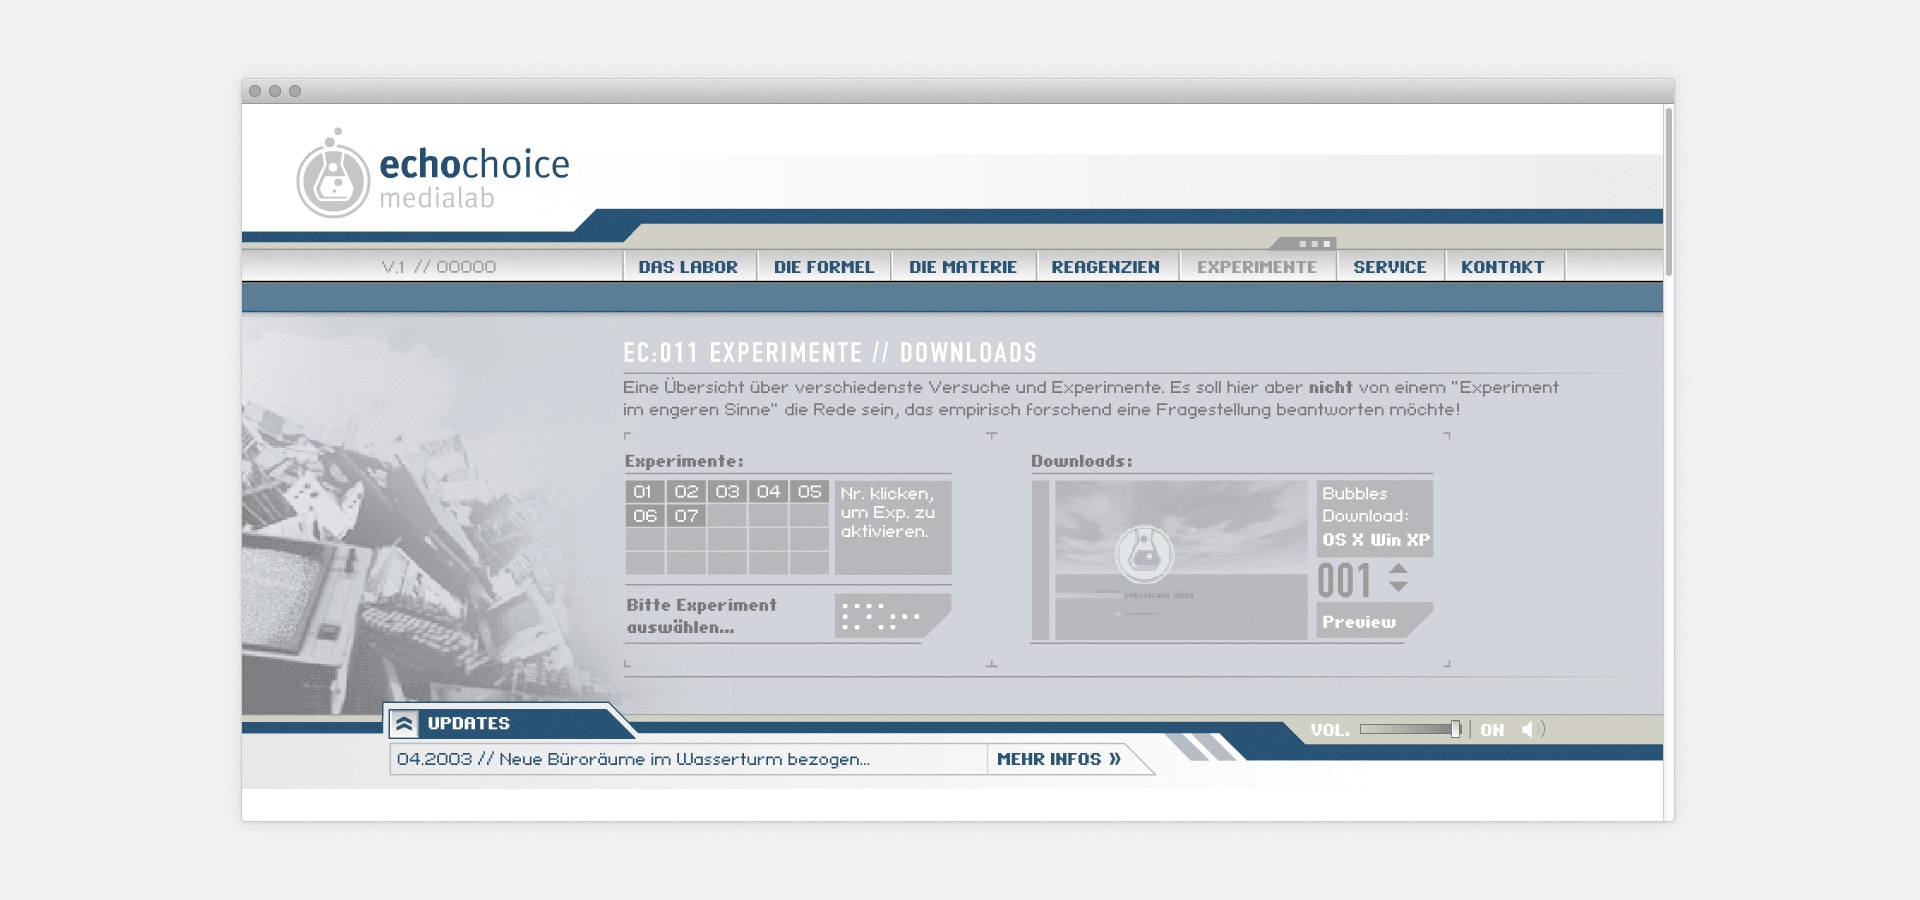 Spielwiese, Experimente echochoice medialab Website